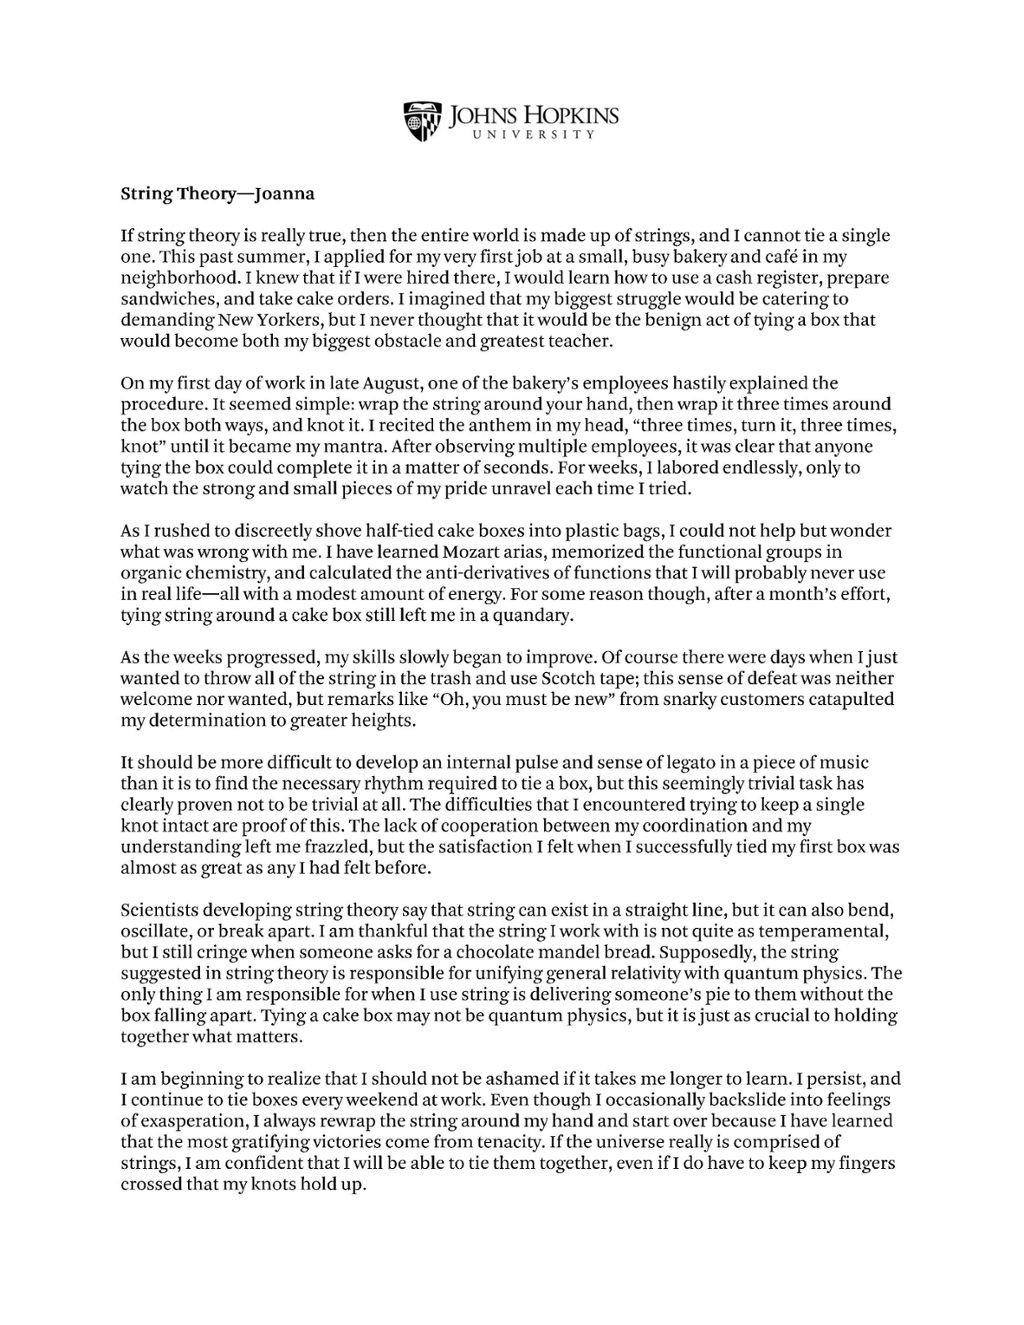 002 Johns Hopkins Essay Staggering University Prompts Supplemental Tips John Examples Large